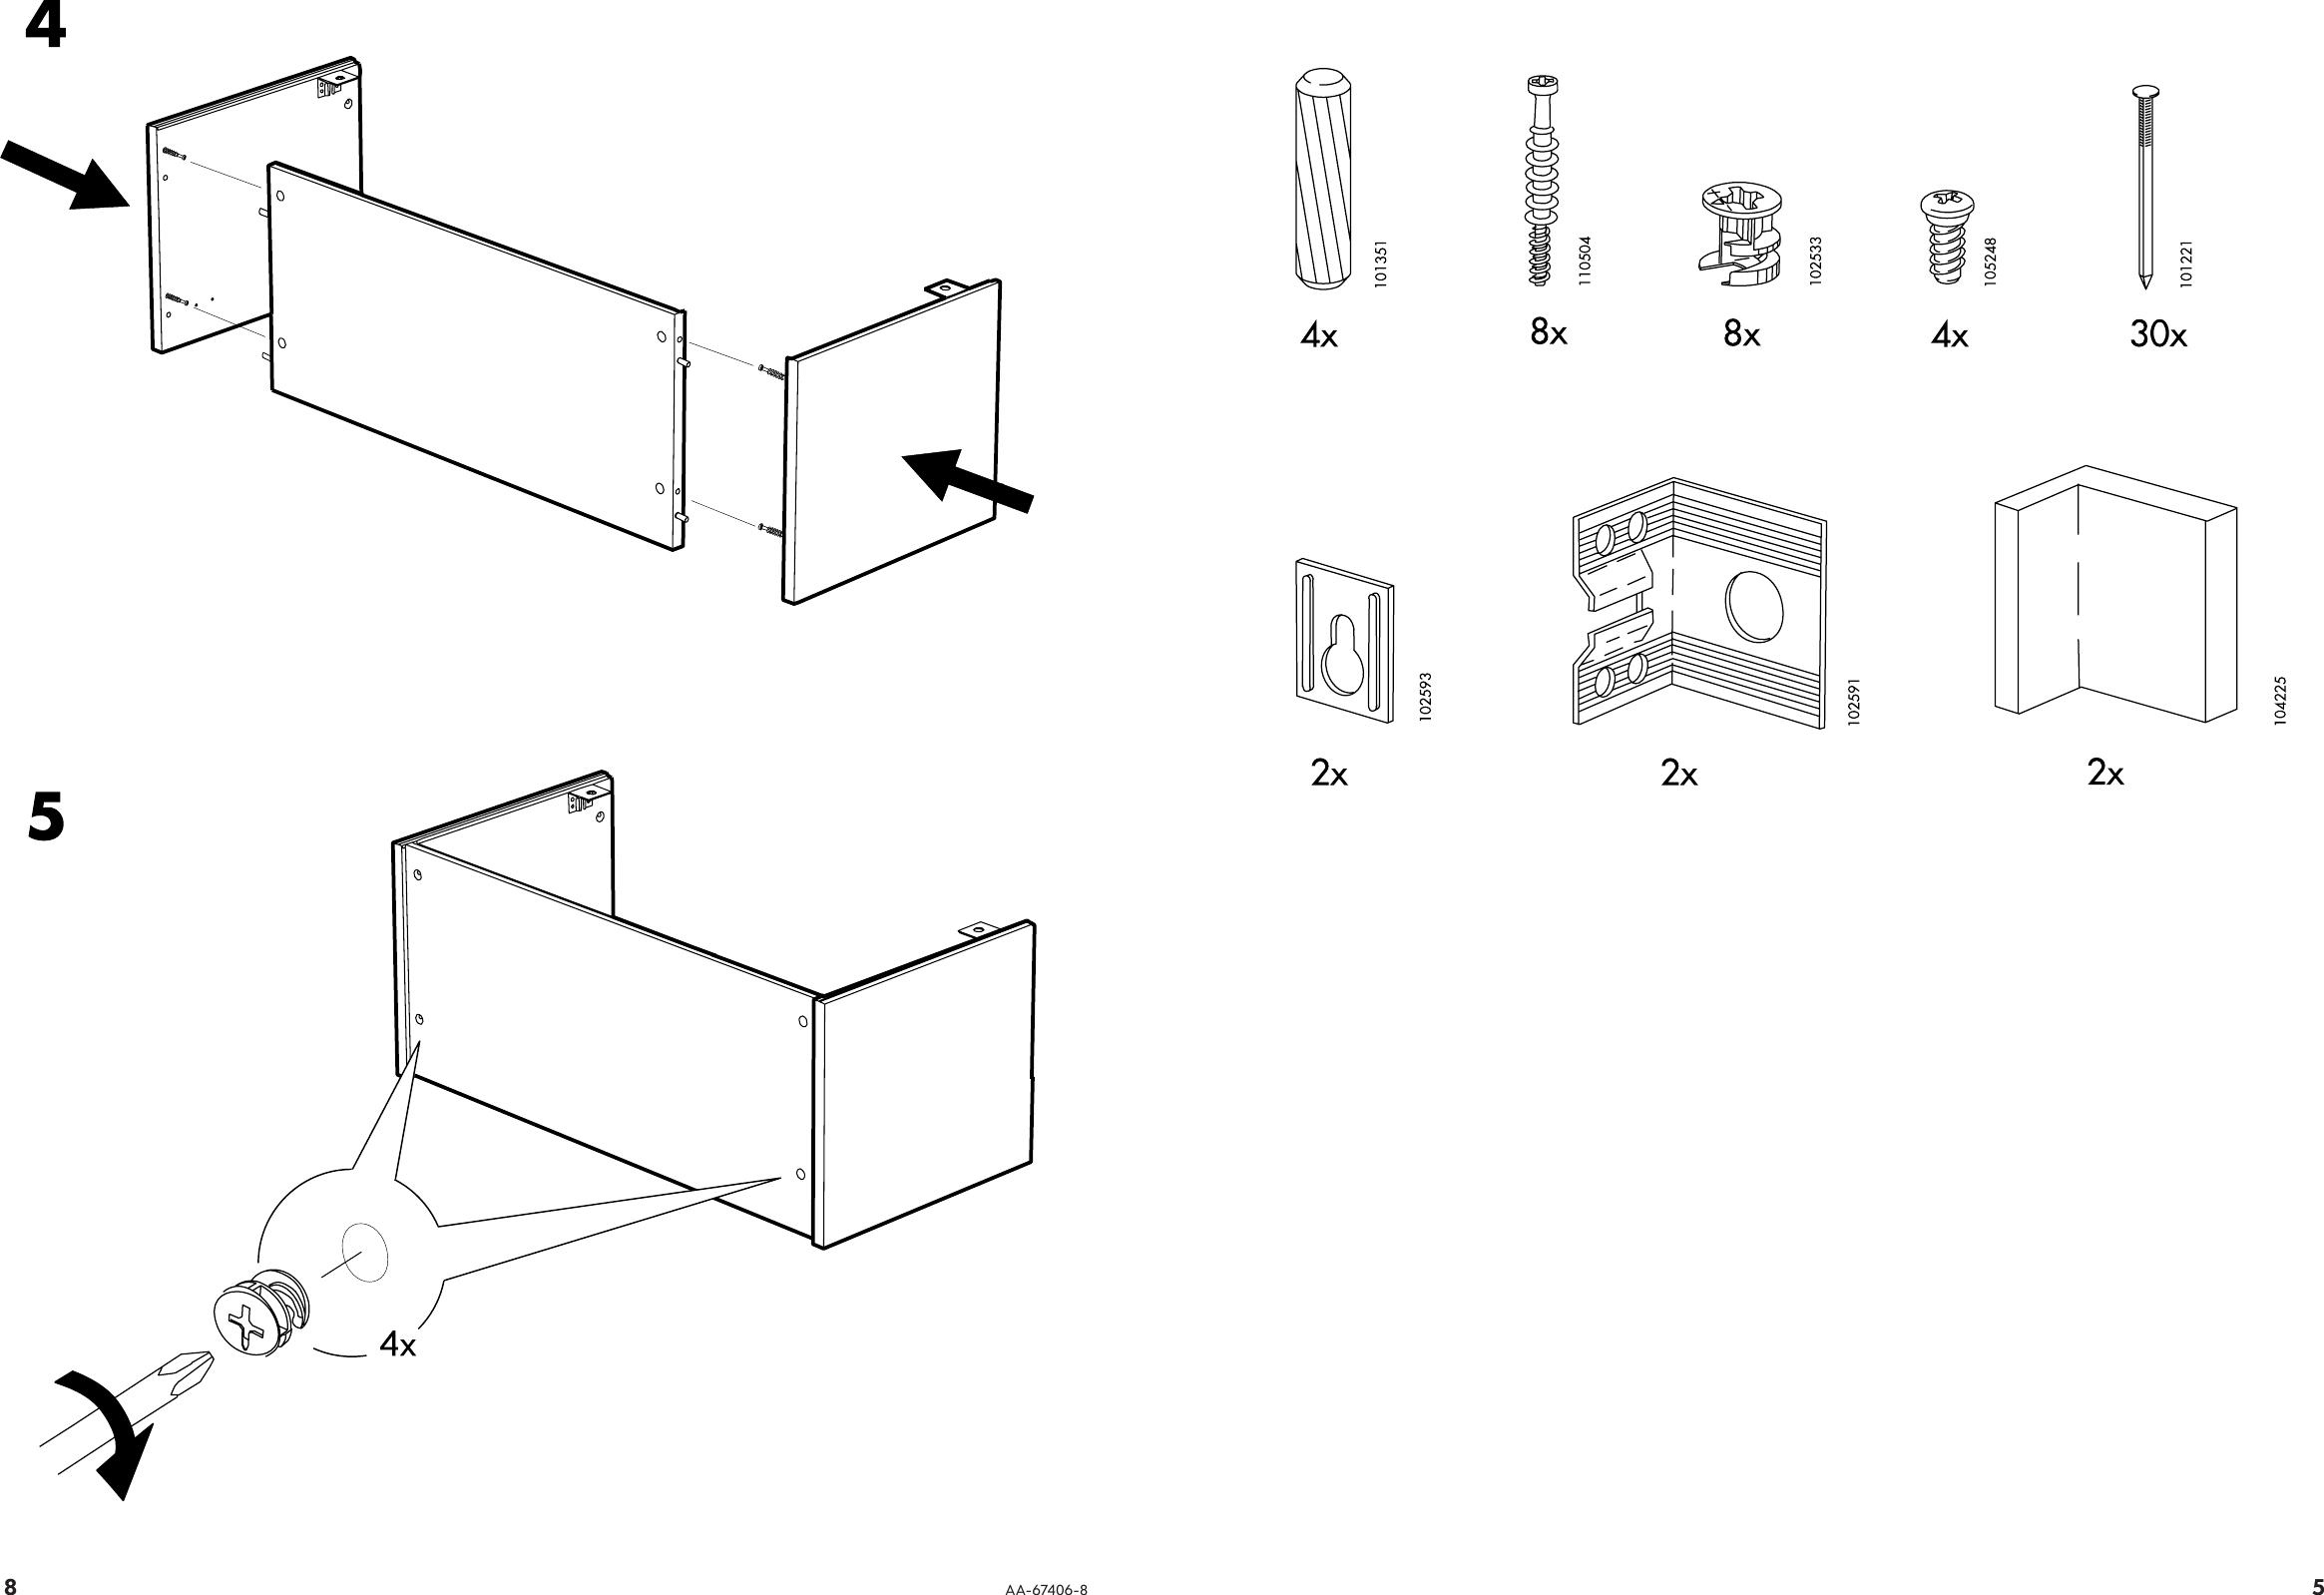 ikea effektiv assembly instructions